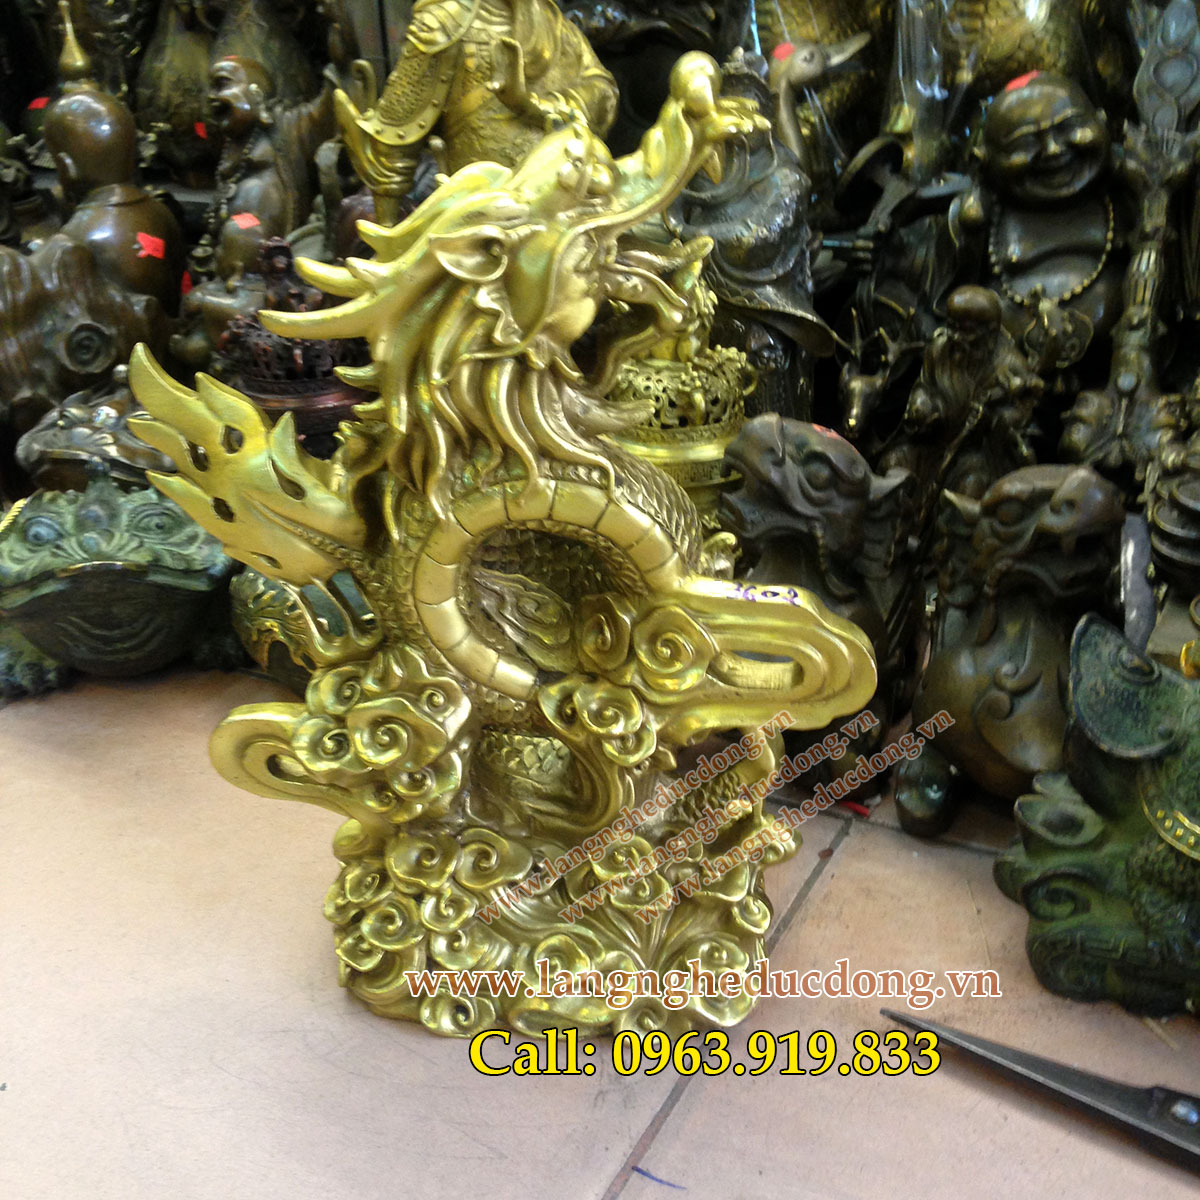 langngheducdong.vn - Tượng Rồng Phong thủy cao 35cm, tượng rồng phong thủy